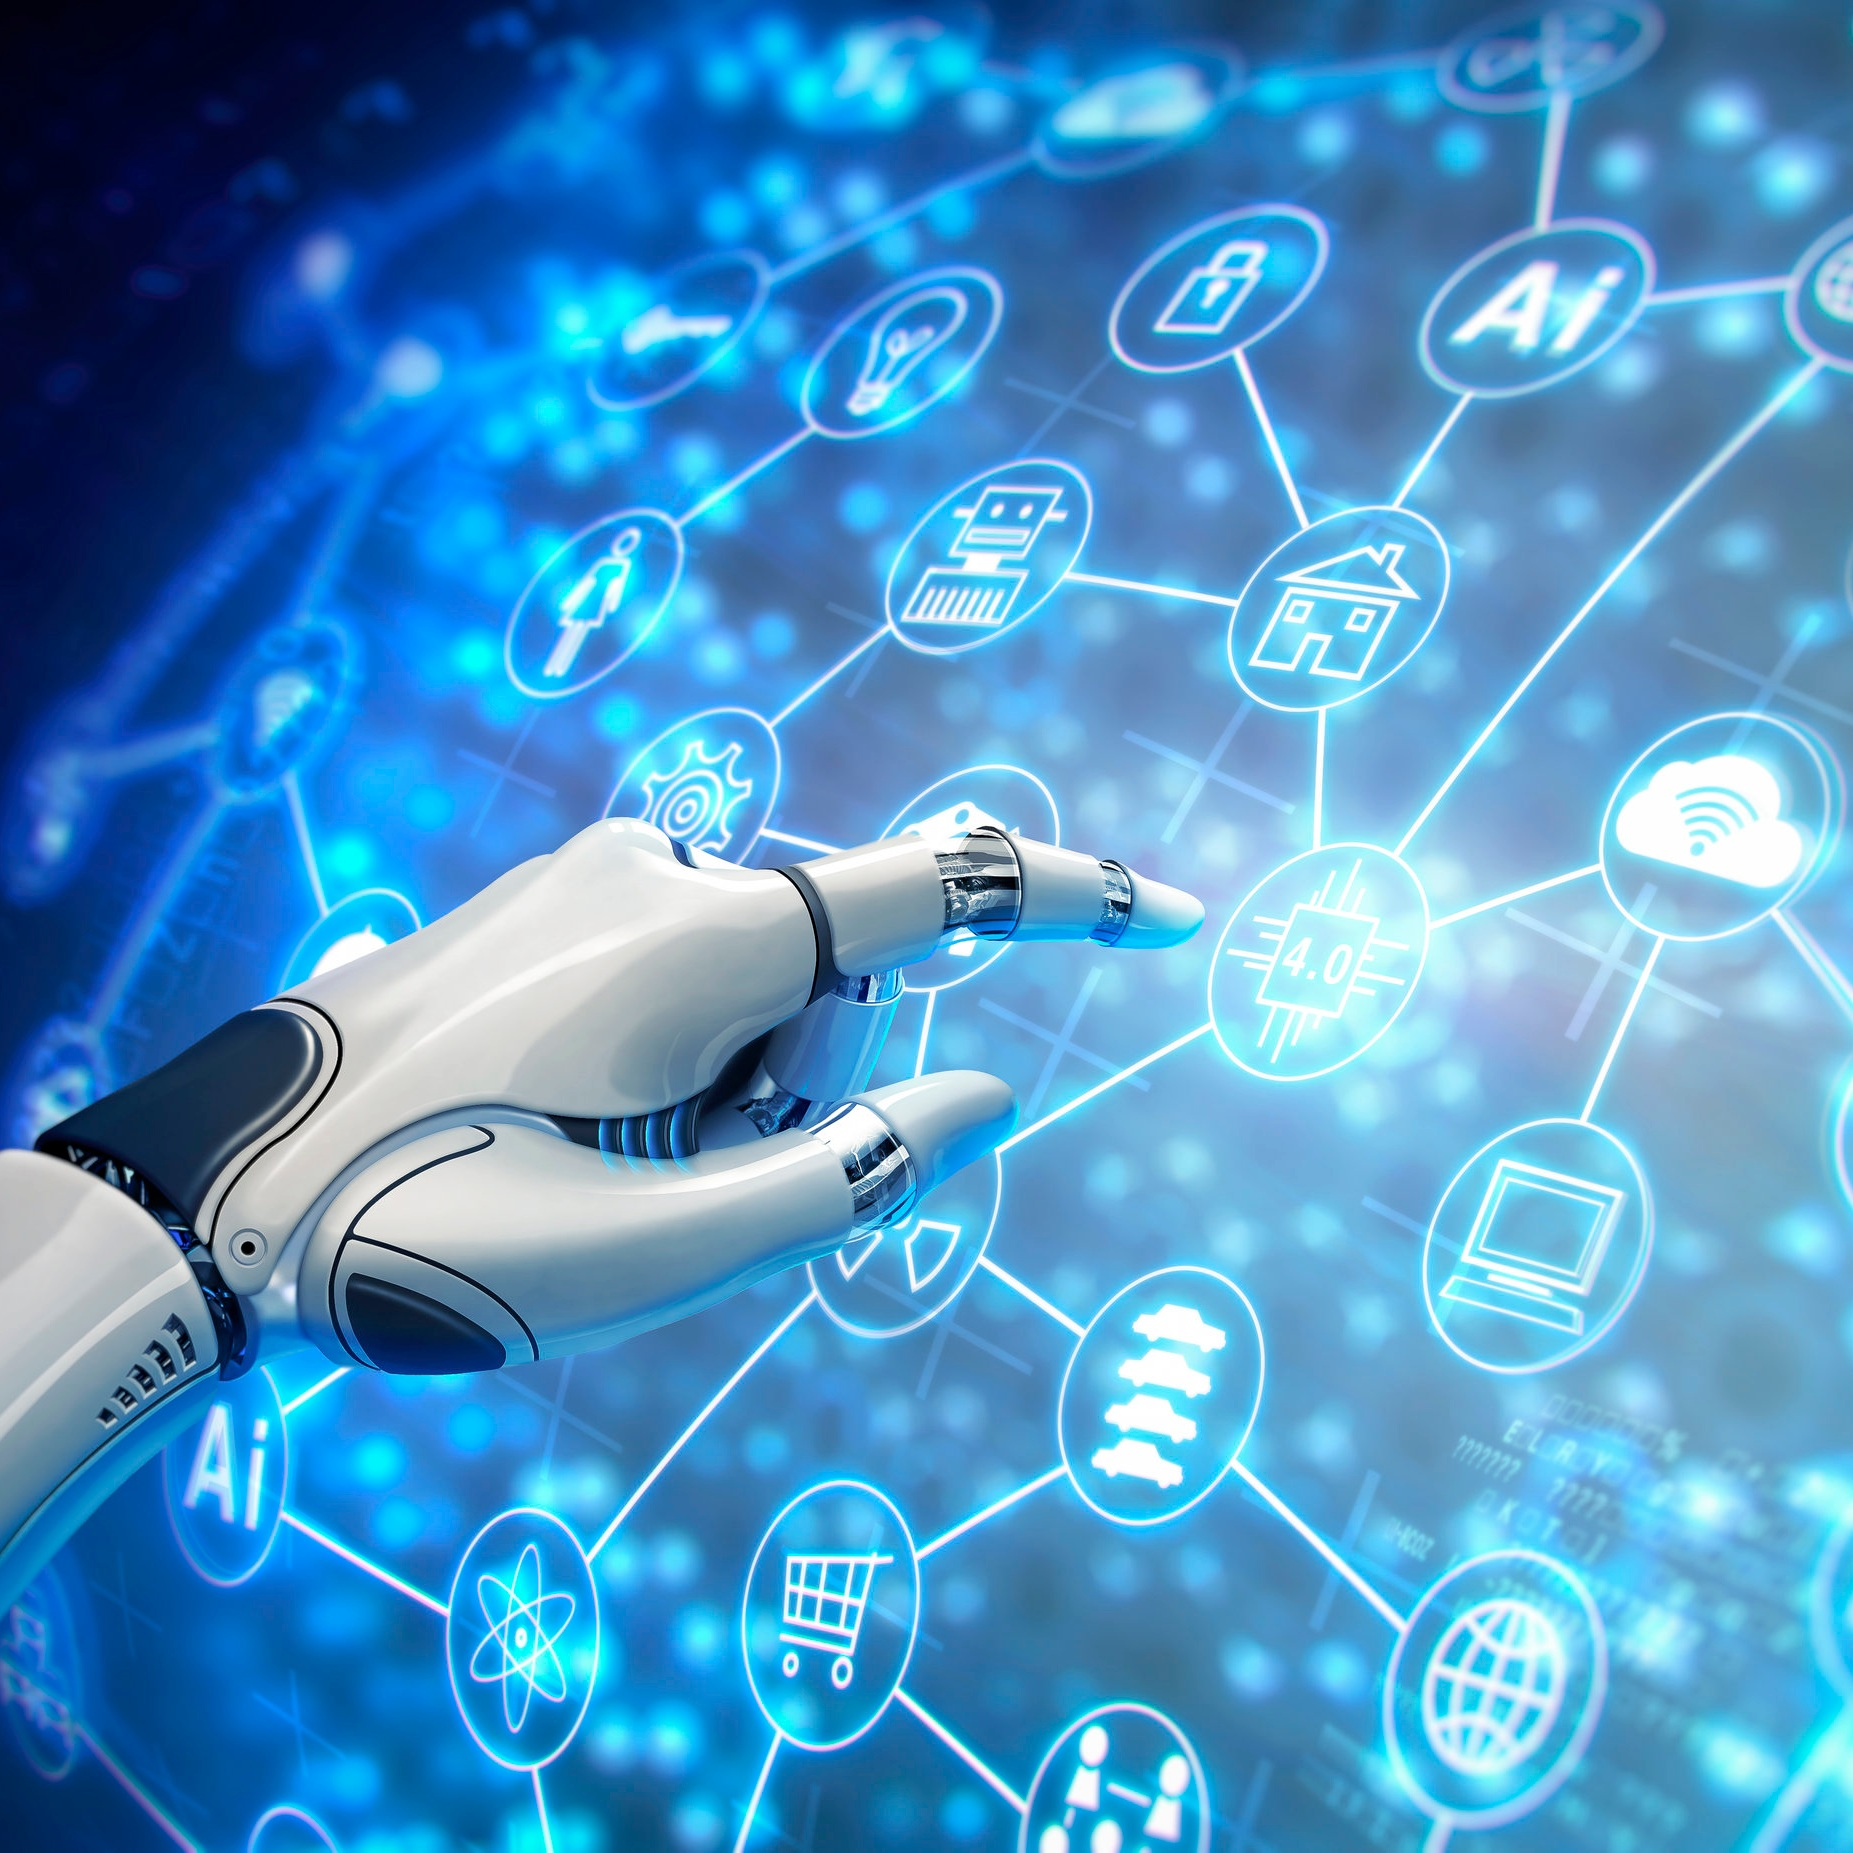 Robotics & Autonomous Systems -